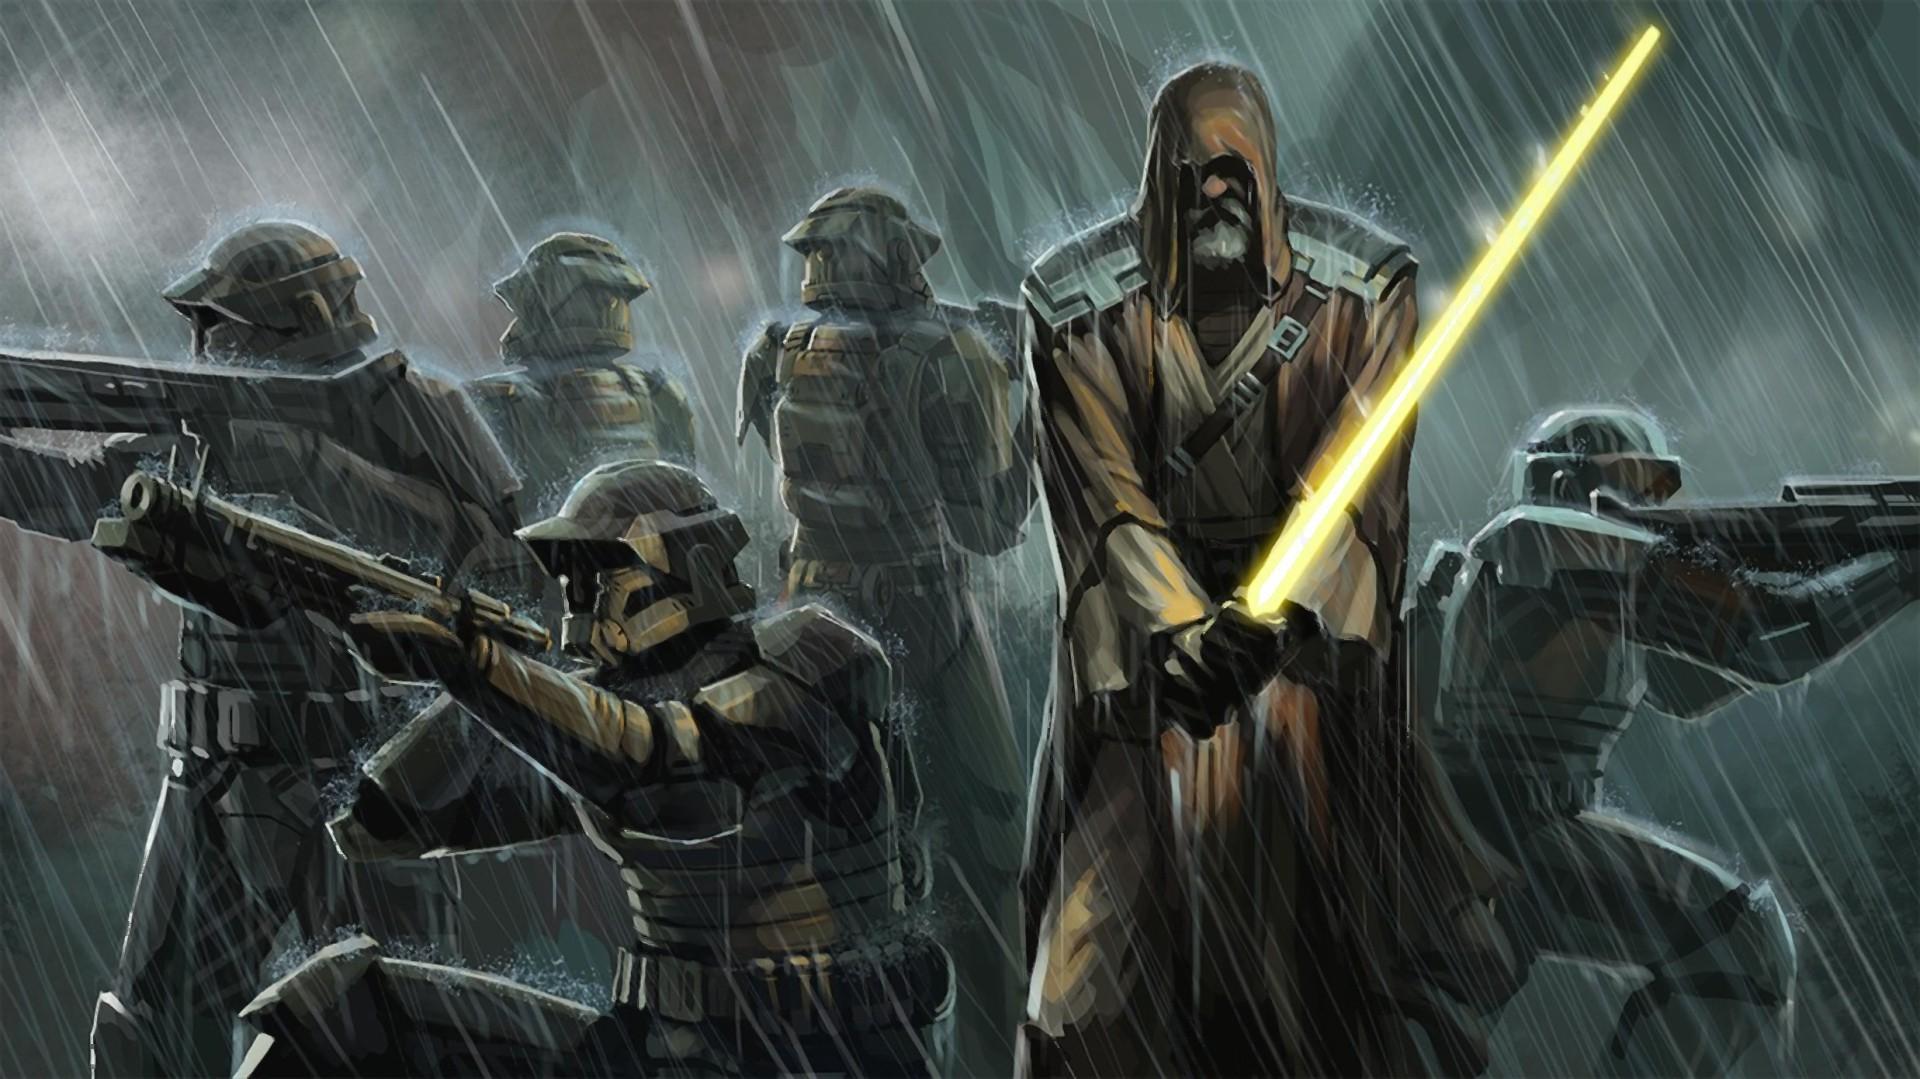 Star Wars Jedi Mythology Screenshot Warlord 1920x1079 Px Computer Wallpaper Pc Game Mercenary